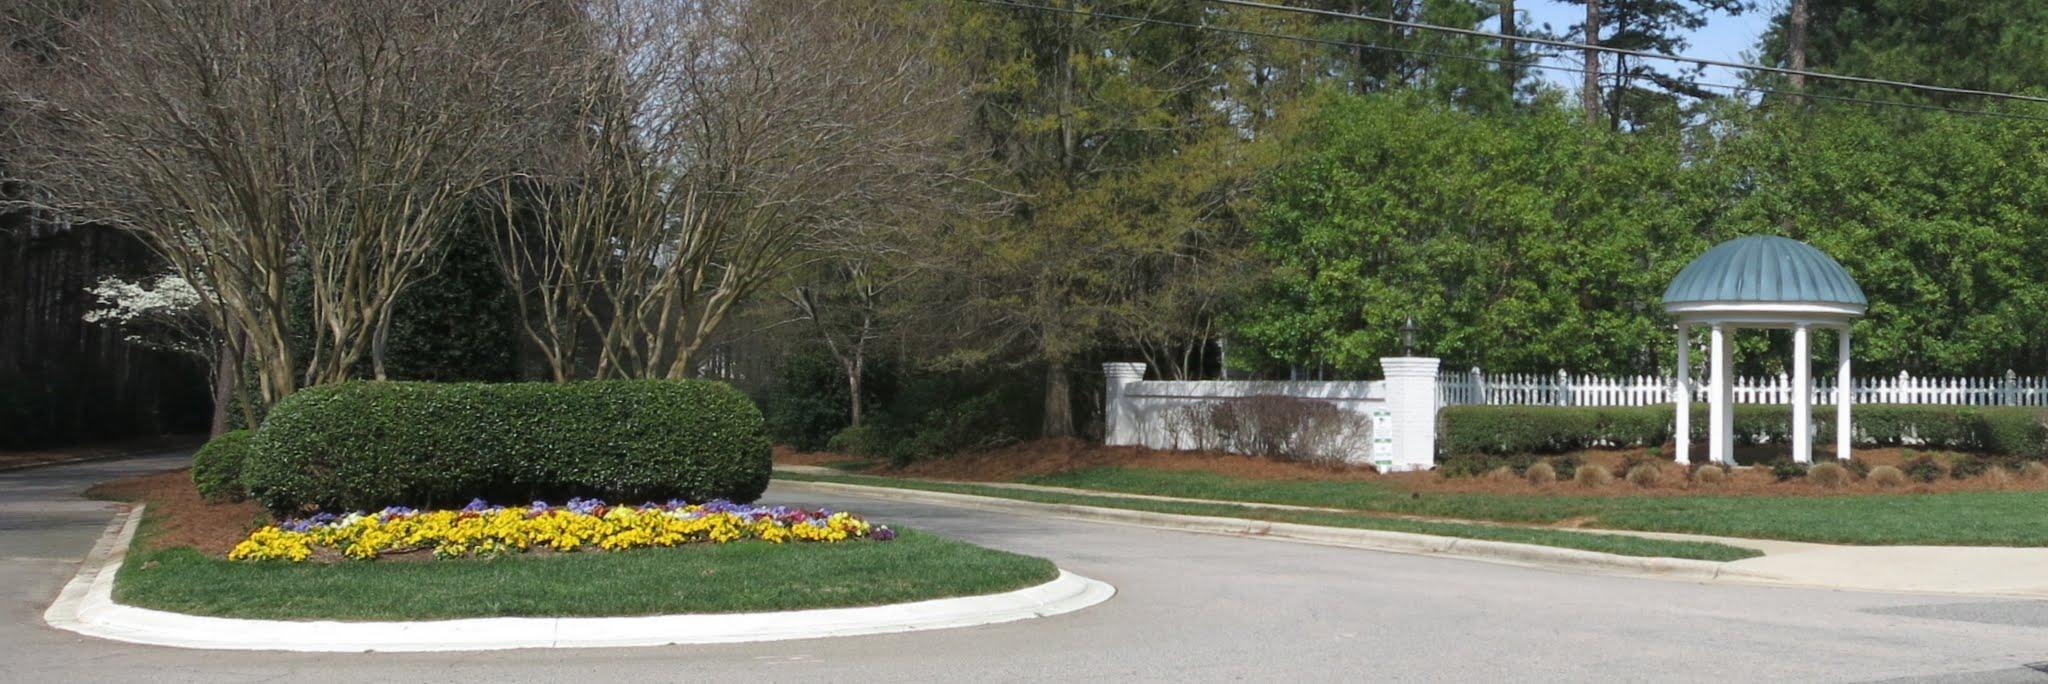 Bent Tree Entrance from Strickland Road, Best Raleigh Neighborhoods, Midtown, Bent Tree